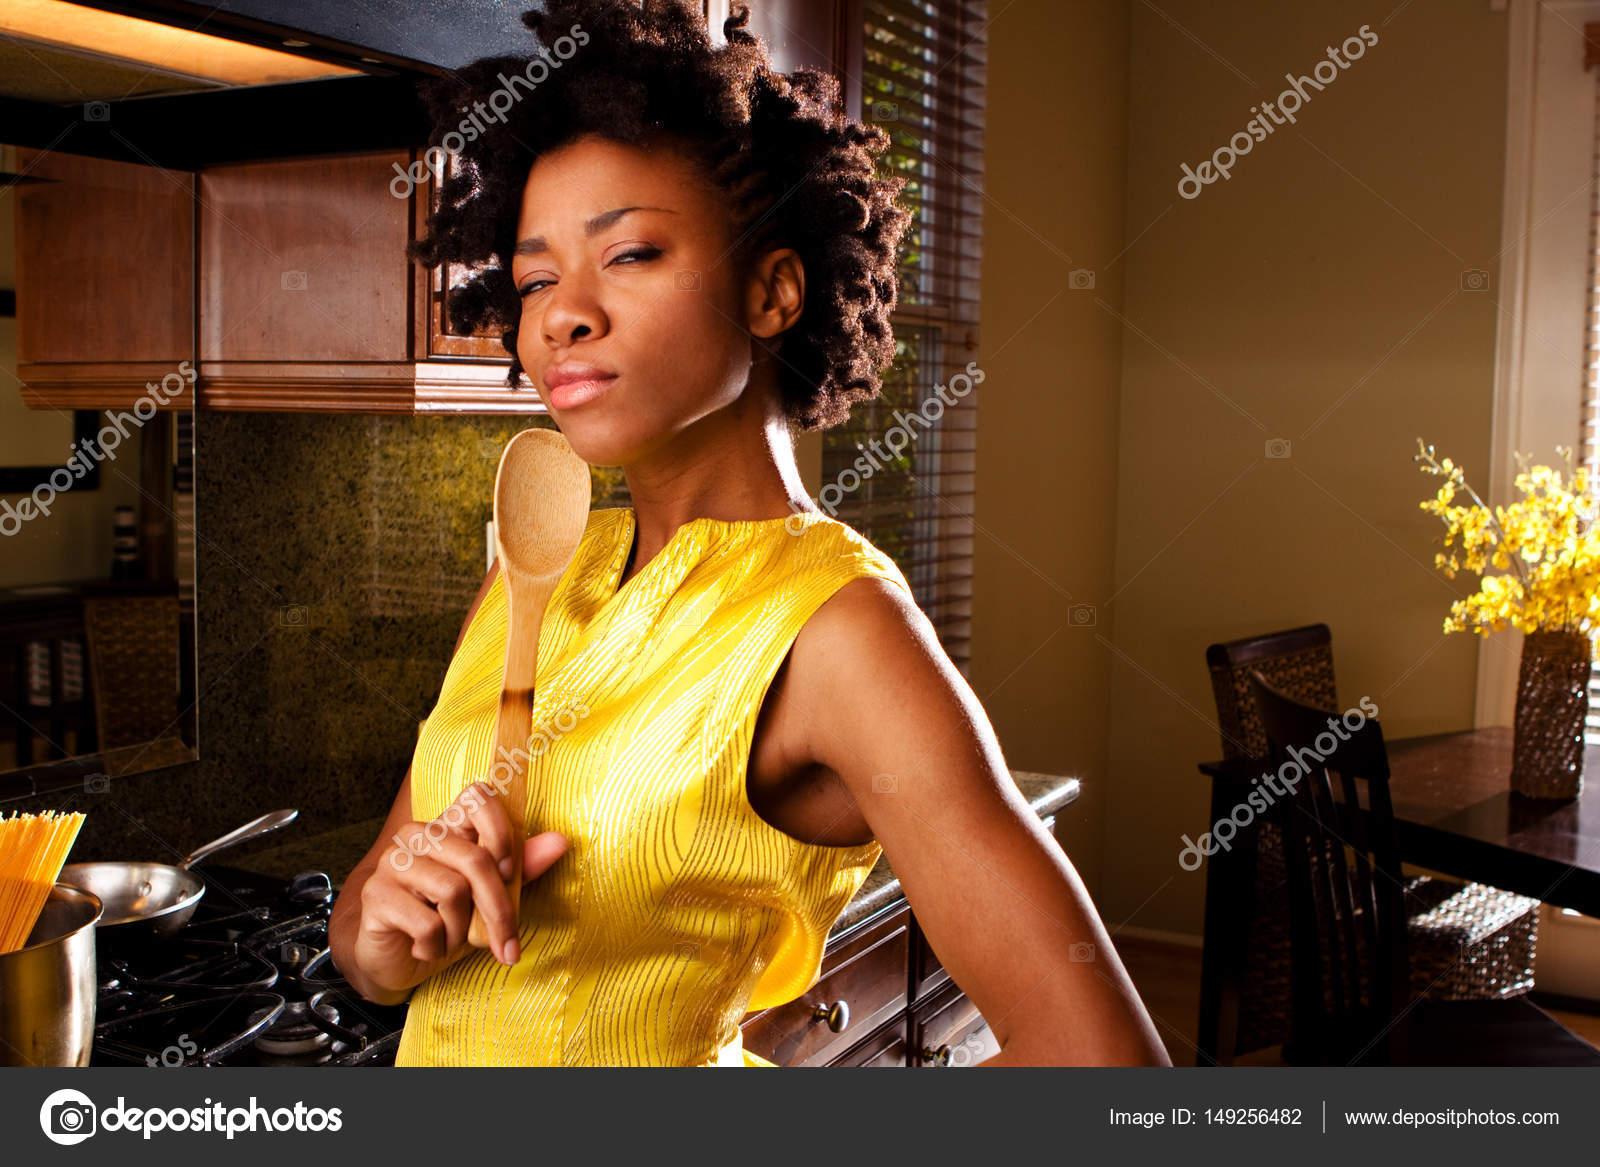 Donna afro-americana in cucina — Foto Stock © pixelheadphoto #149256482